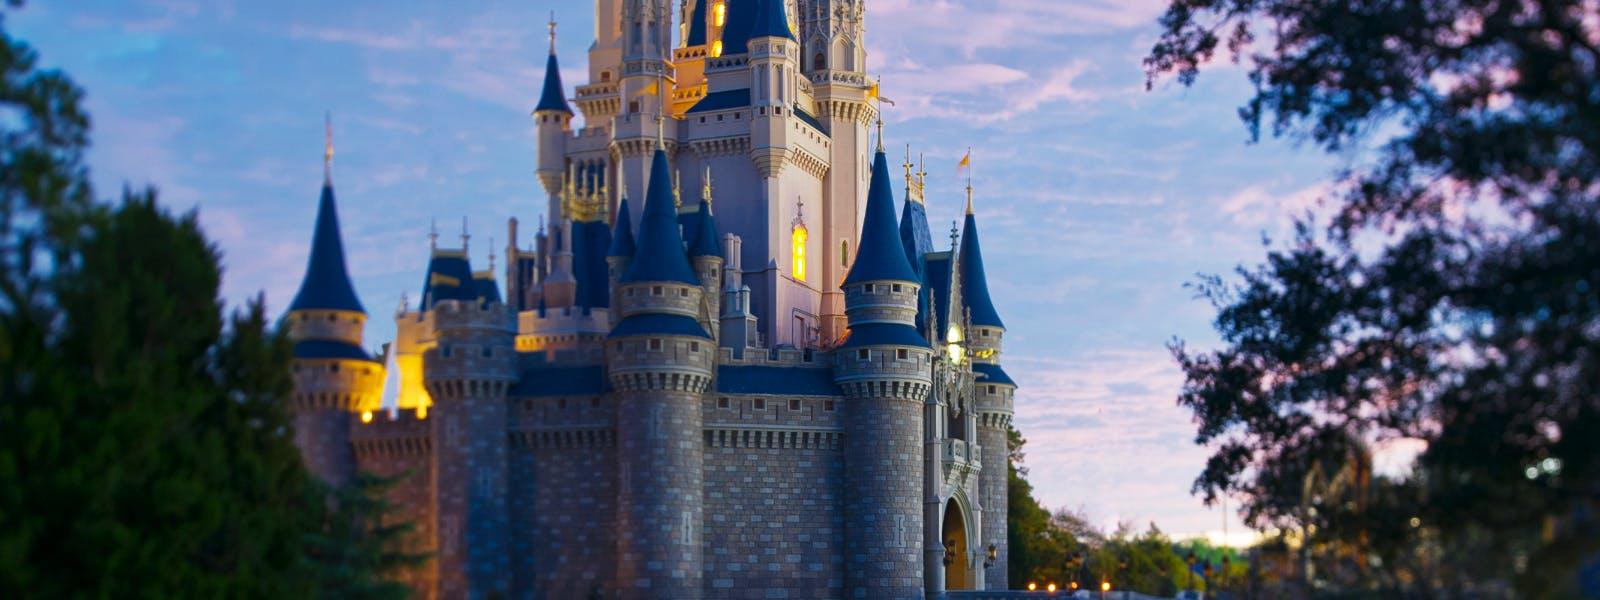 Villas Vacation Homes Walt Disney World Area Magical Memories